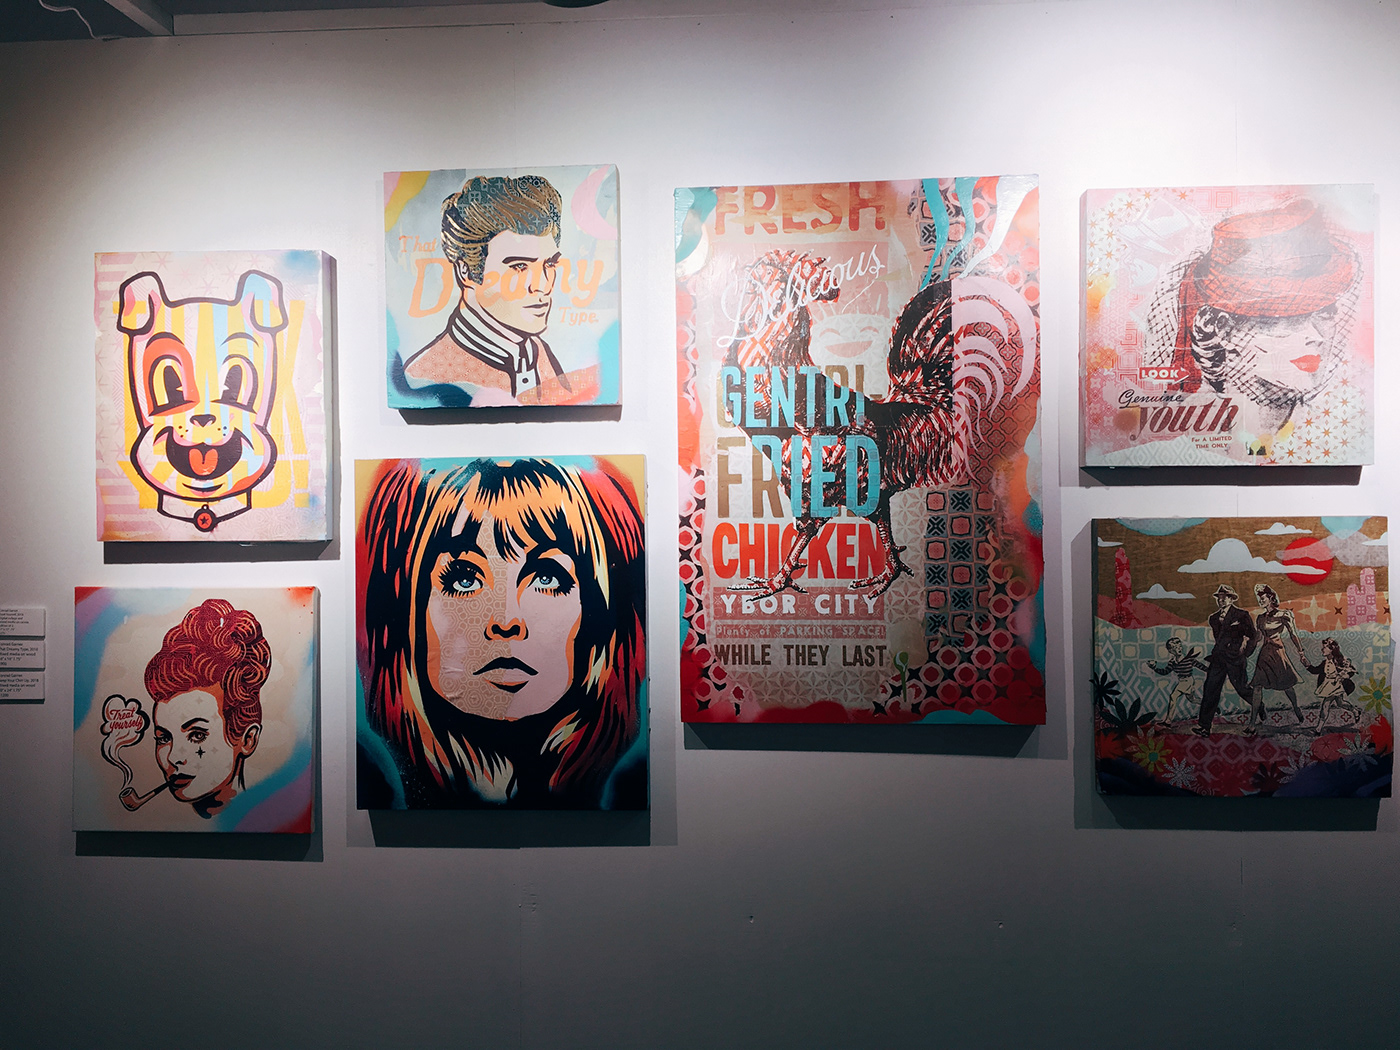 spray paint stencil art paint art show Breaking Patterns cass contemporary epicurean hotel tampa Conrad Garner